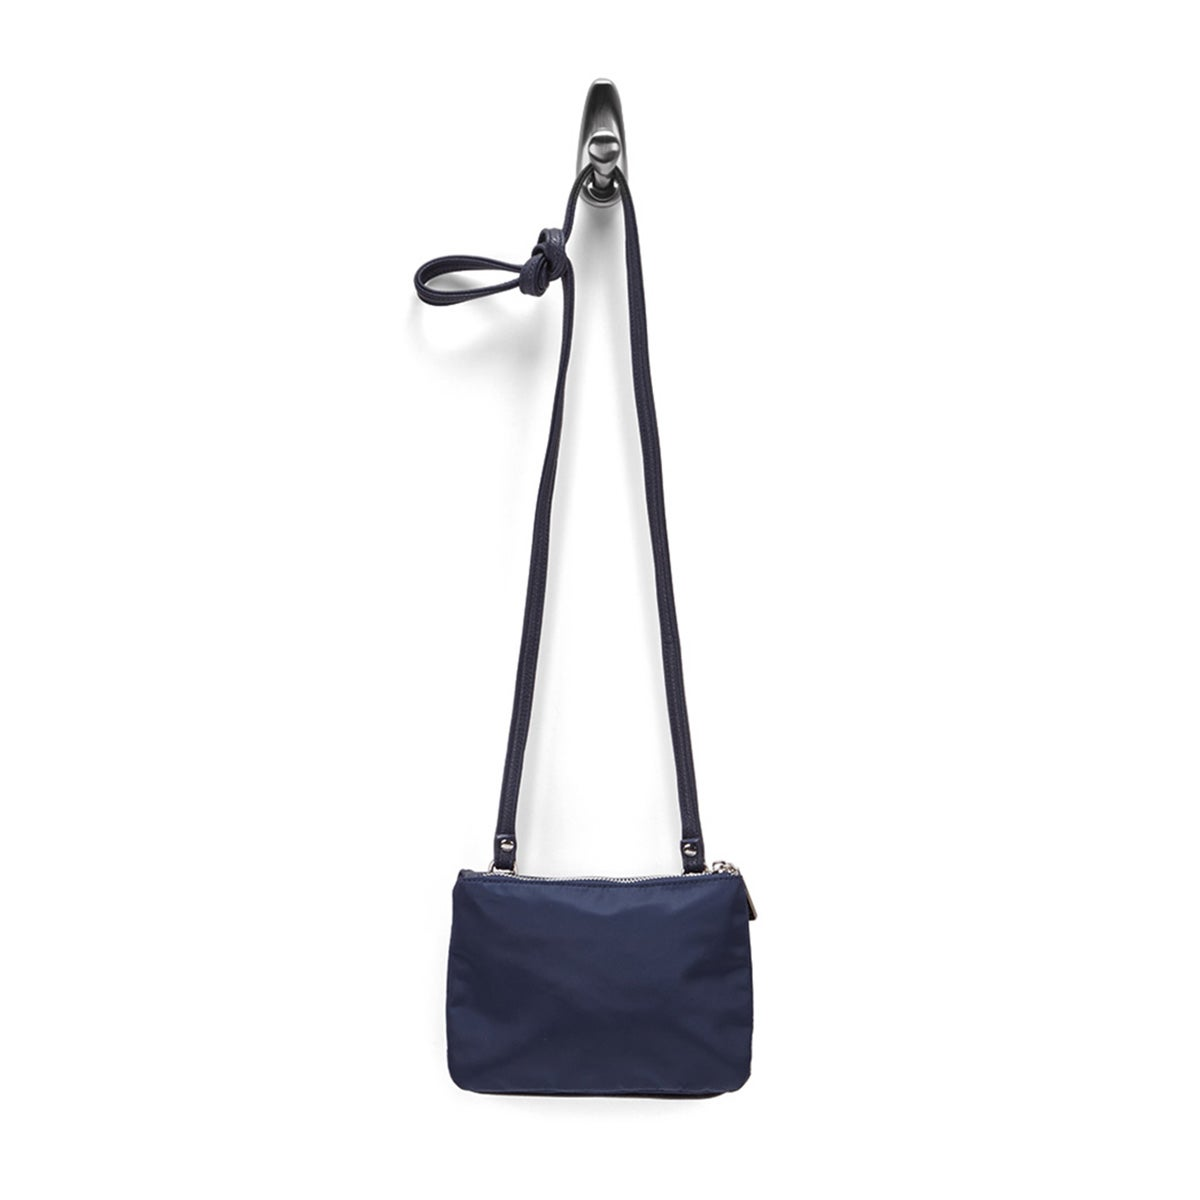 Lds Roots73 nvy mini crossbody bag